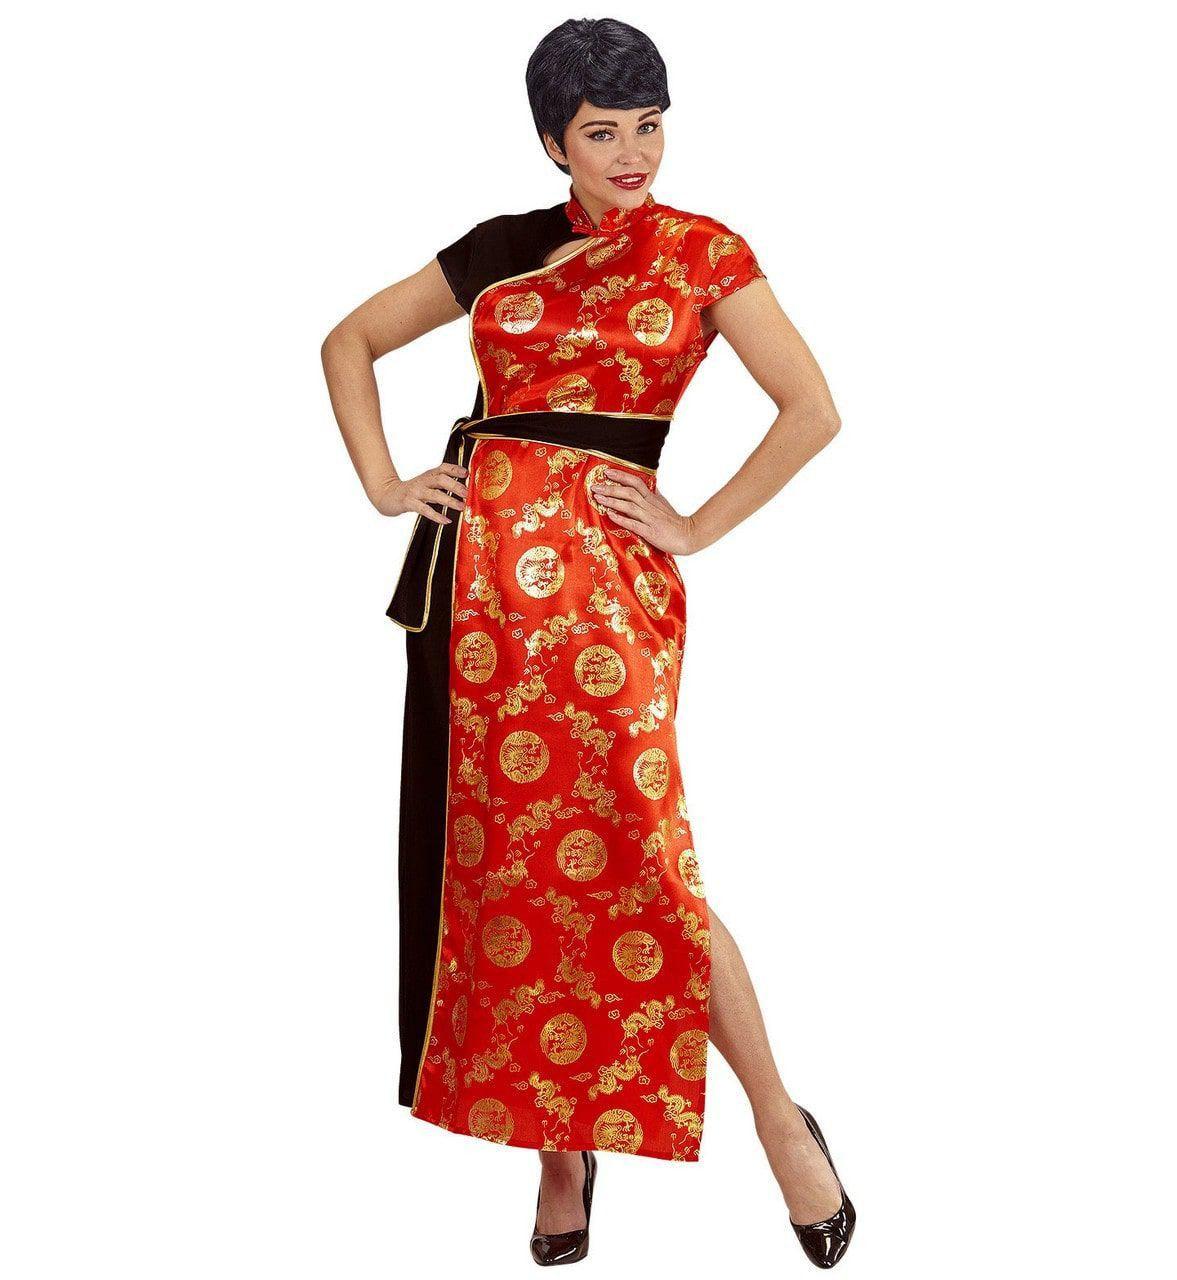 China Girl Foek Mi Vrouw Kostuum